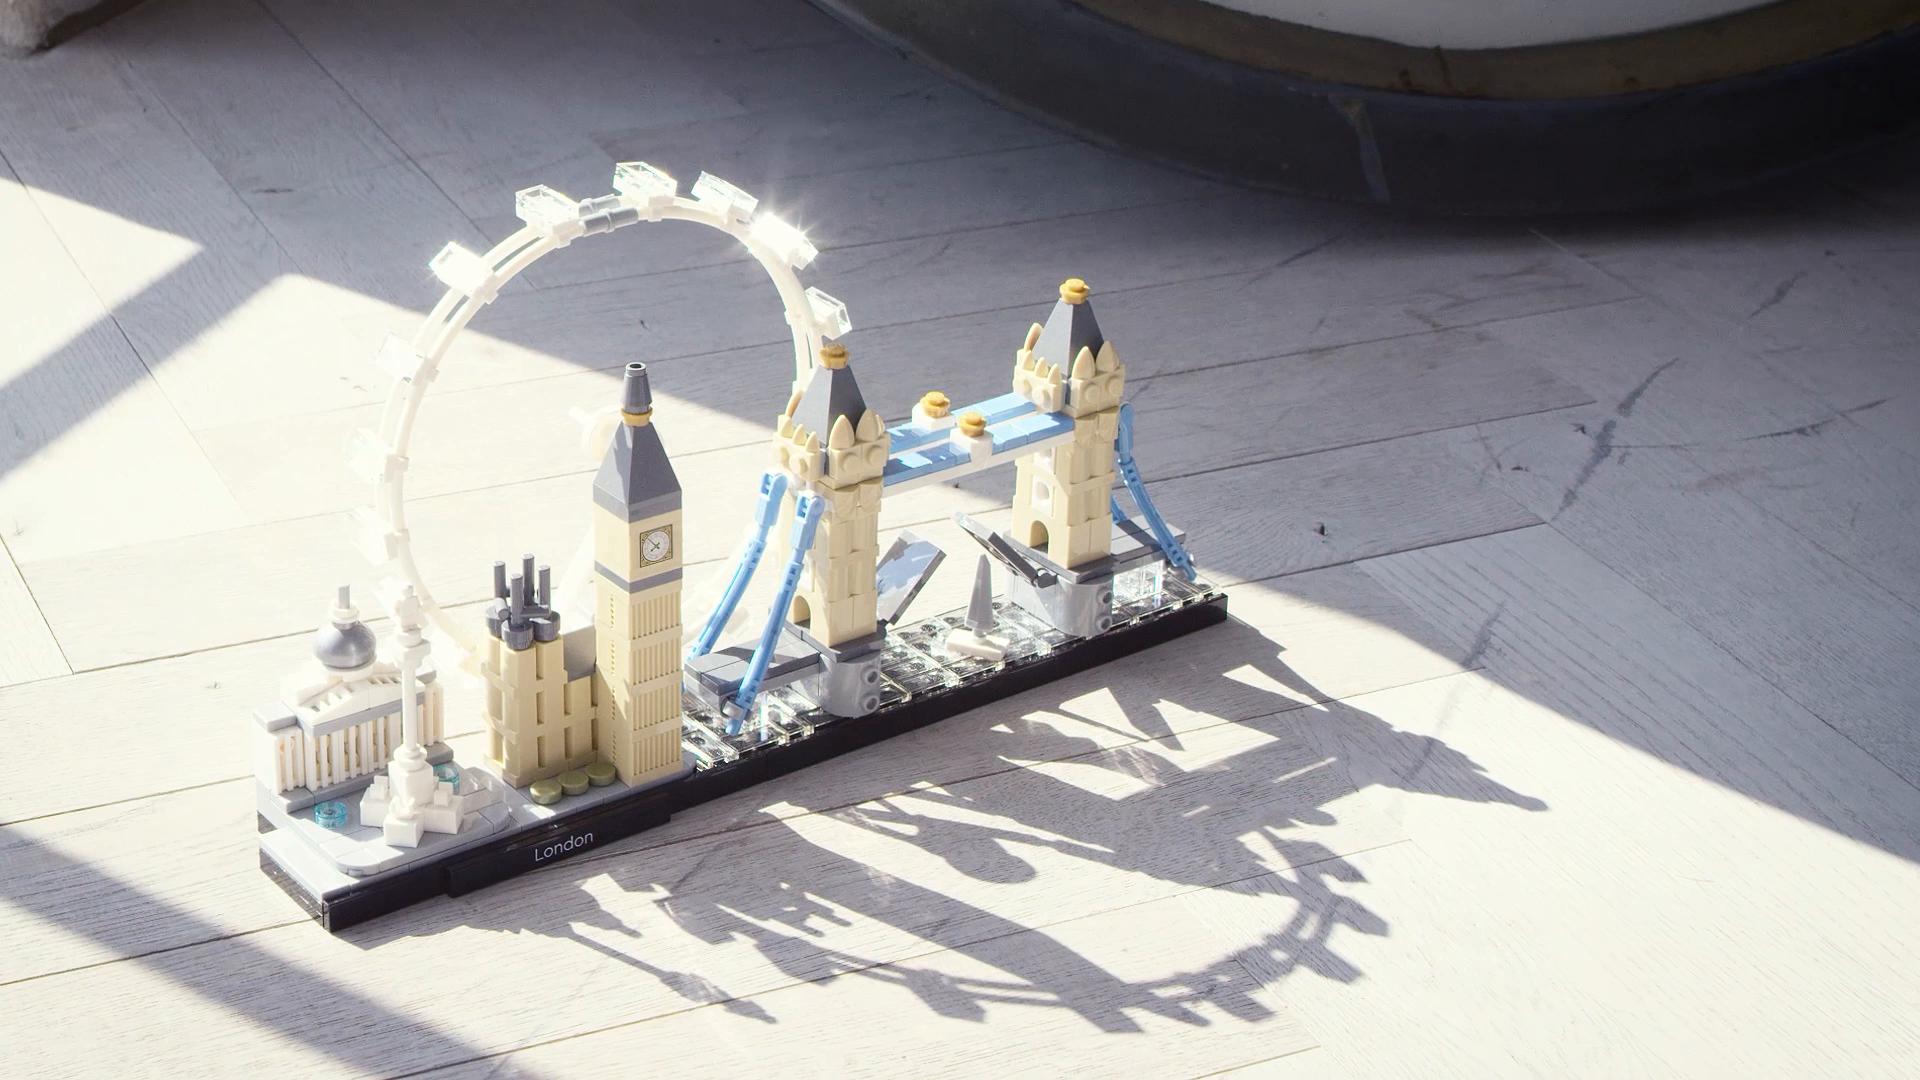 Lego Architecture London 21034 Building Kit